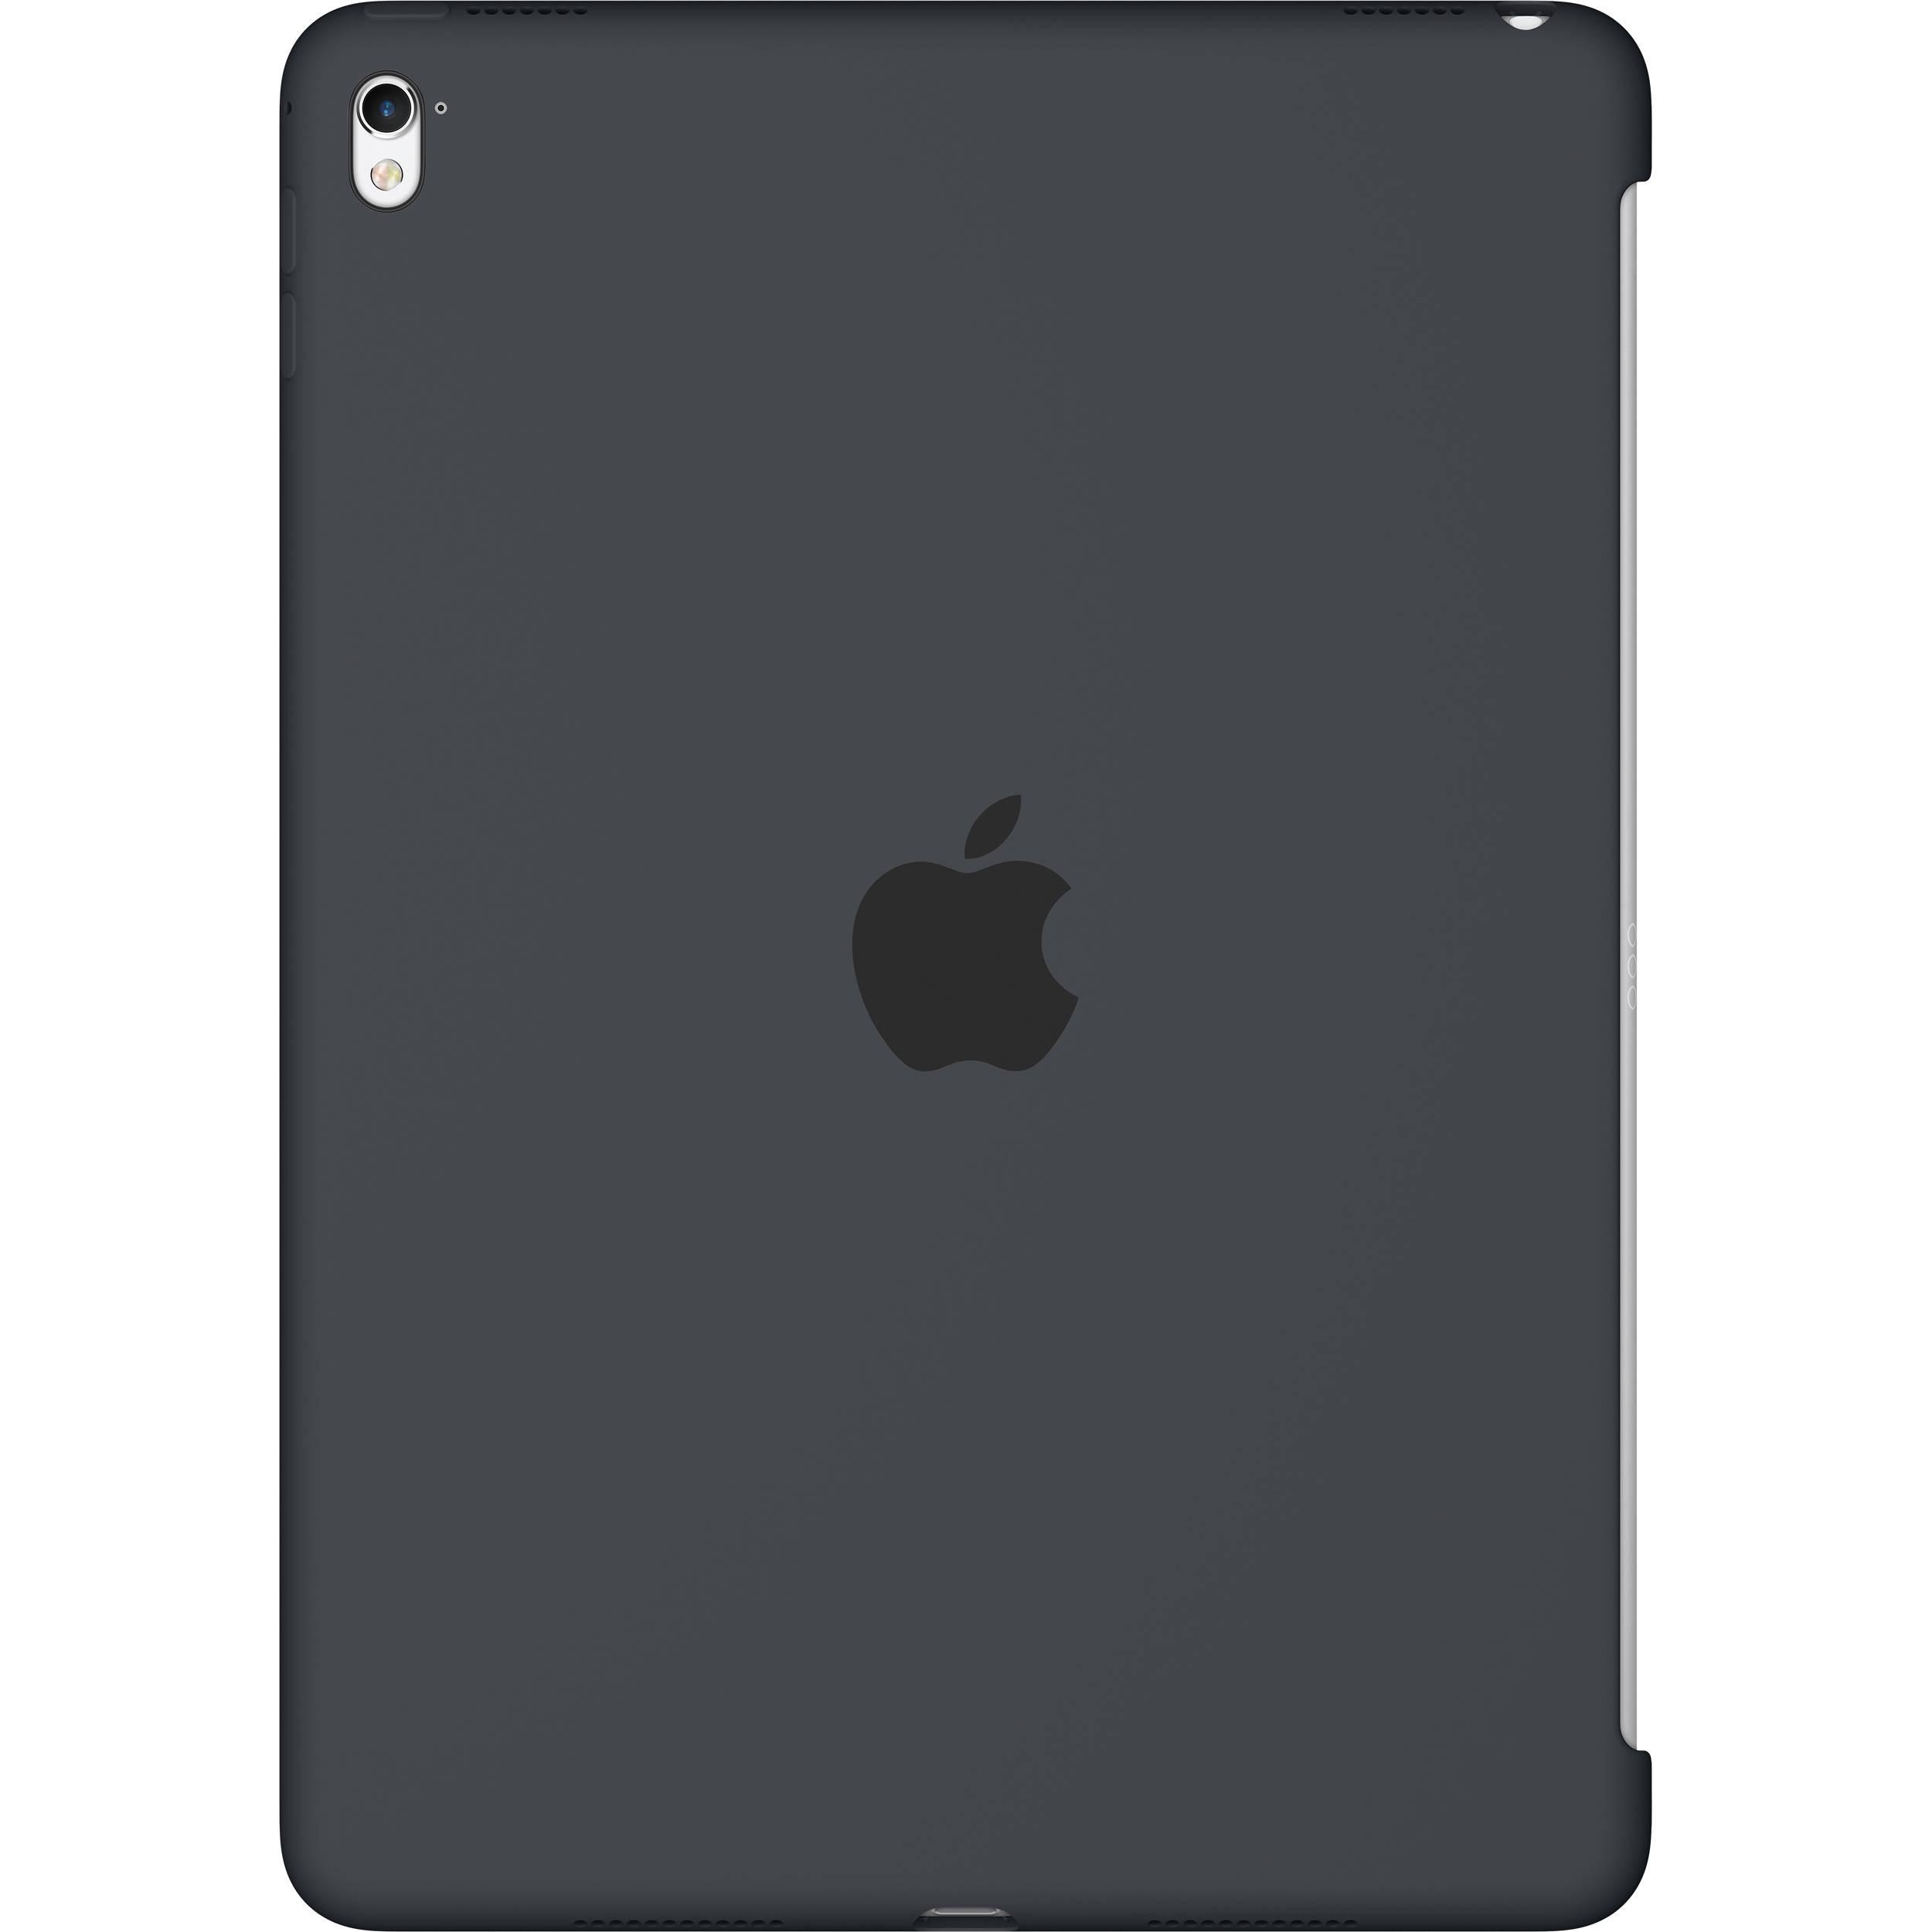 low priced e4361 ae3e5 Apple Silicone Case for 9.7